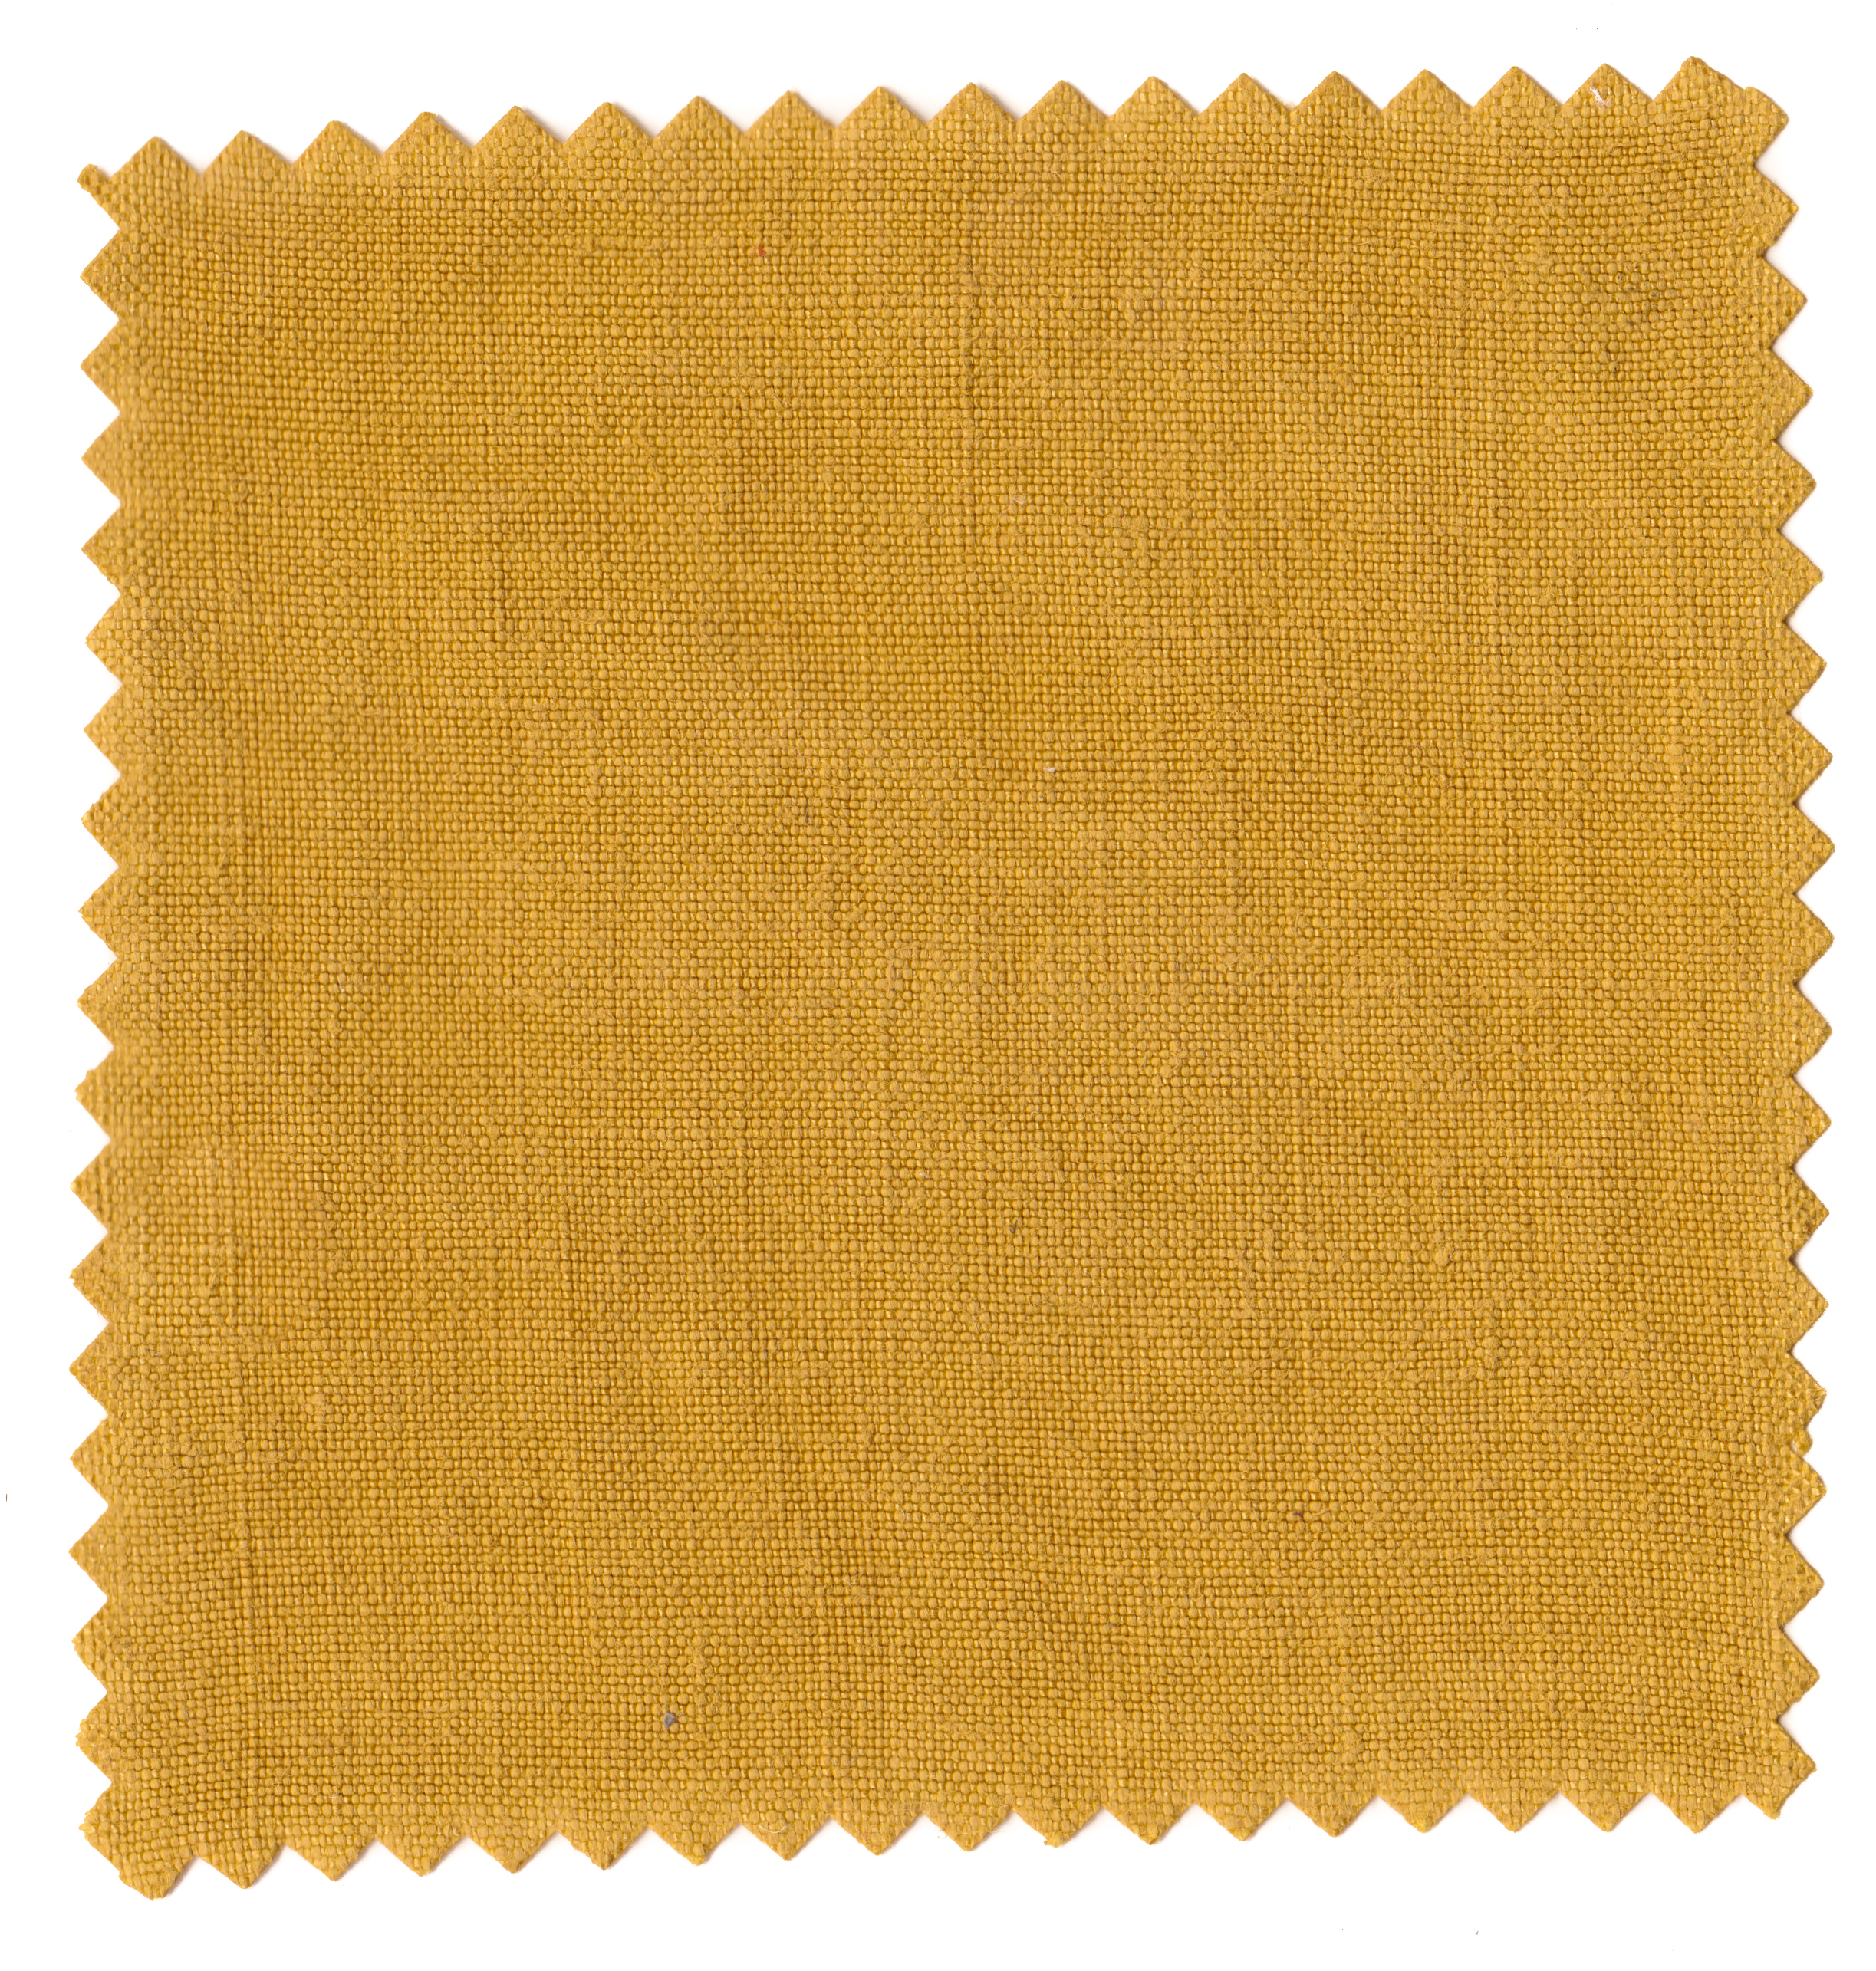 Straw Yellows-3.jpg